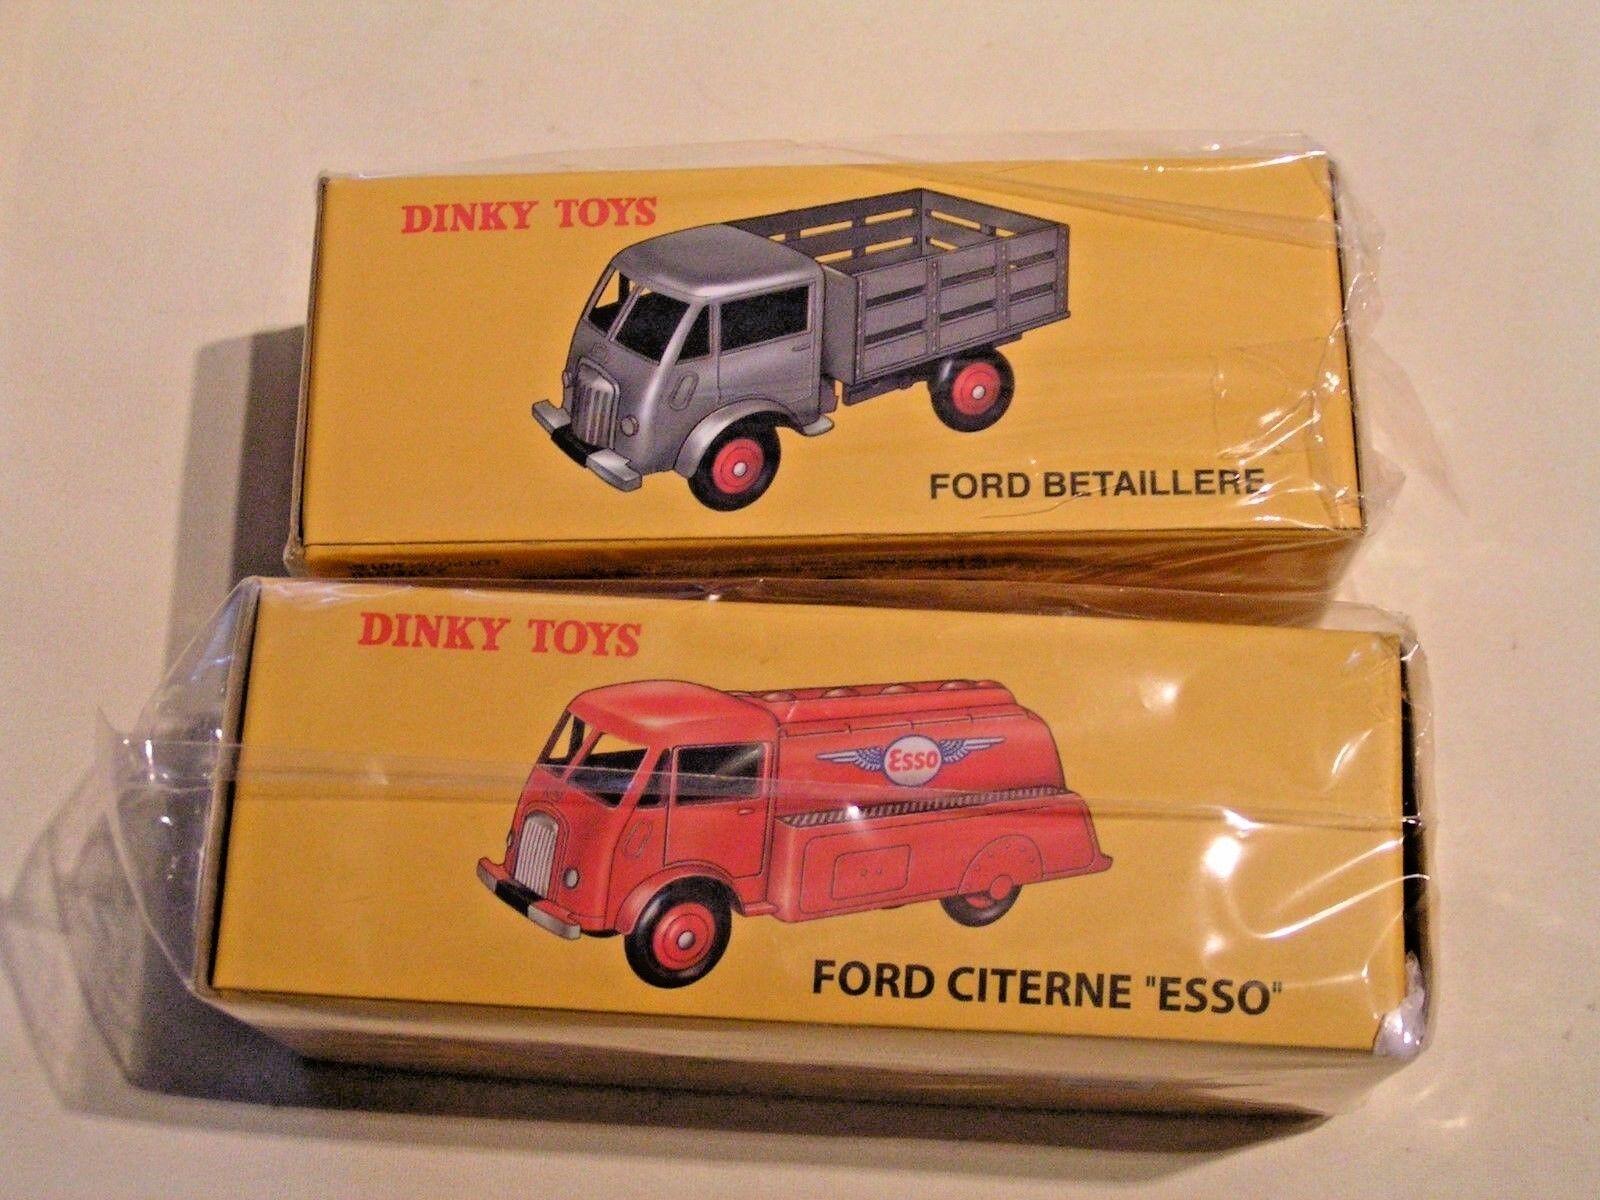 DINKY TOYS (ATLAS) 1 43  -  LOT DE 2 CAMIONS FORD  (EN BOÎTES SCELLEES)